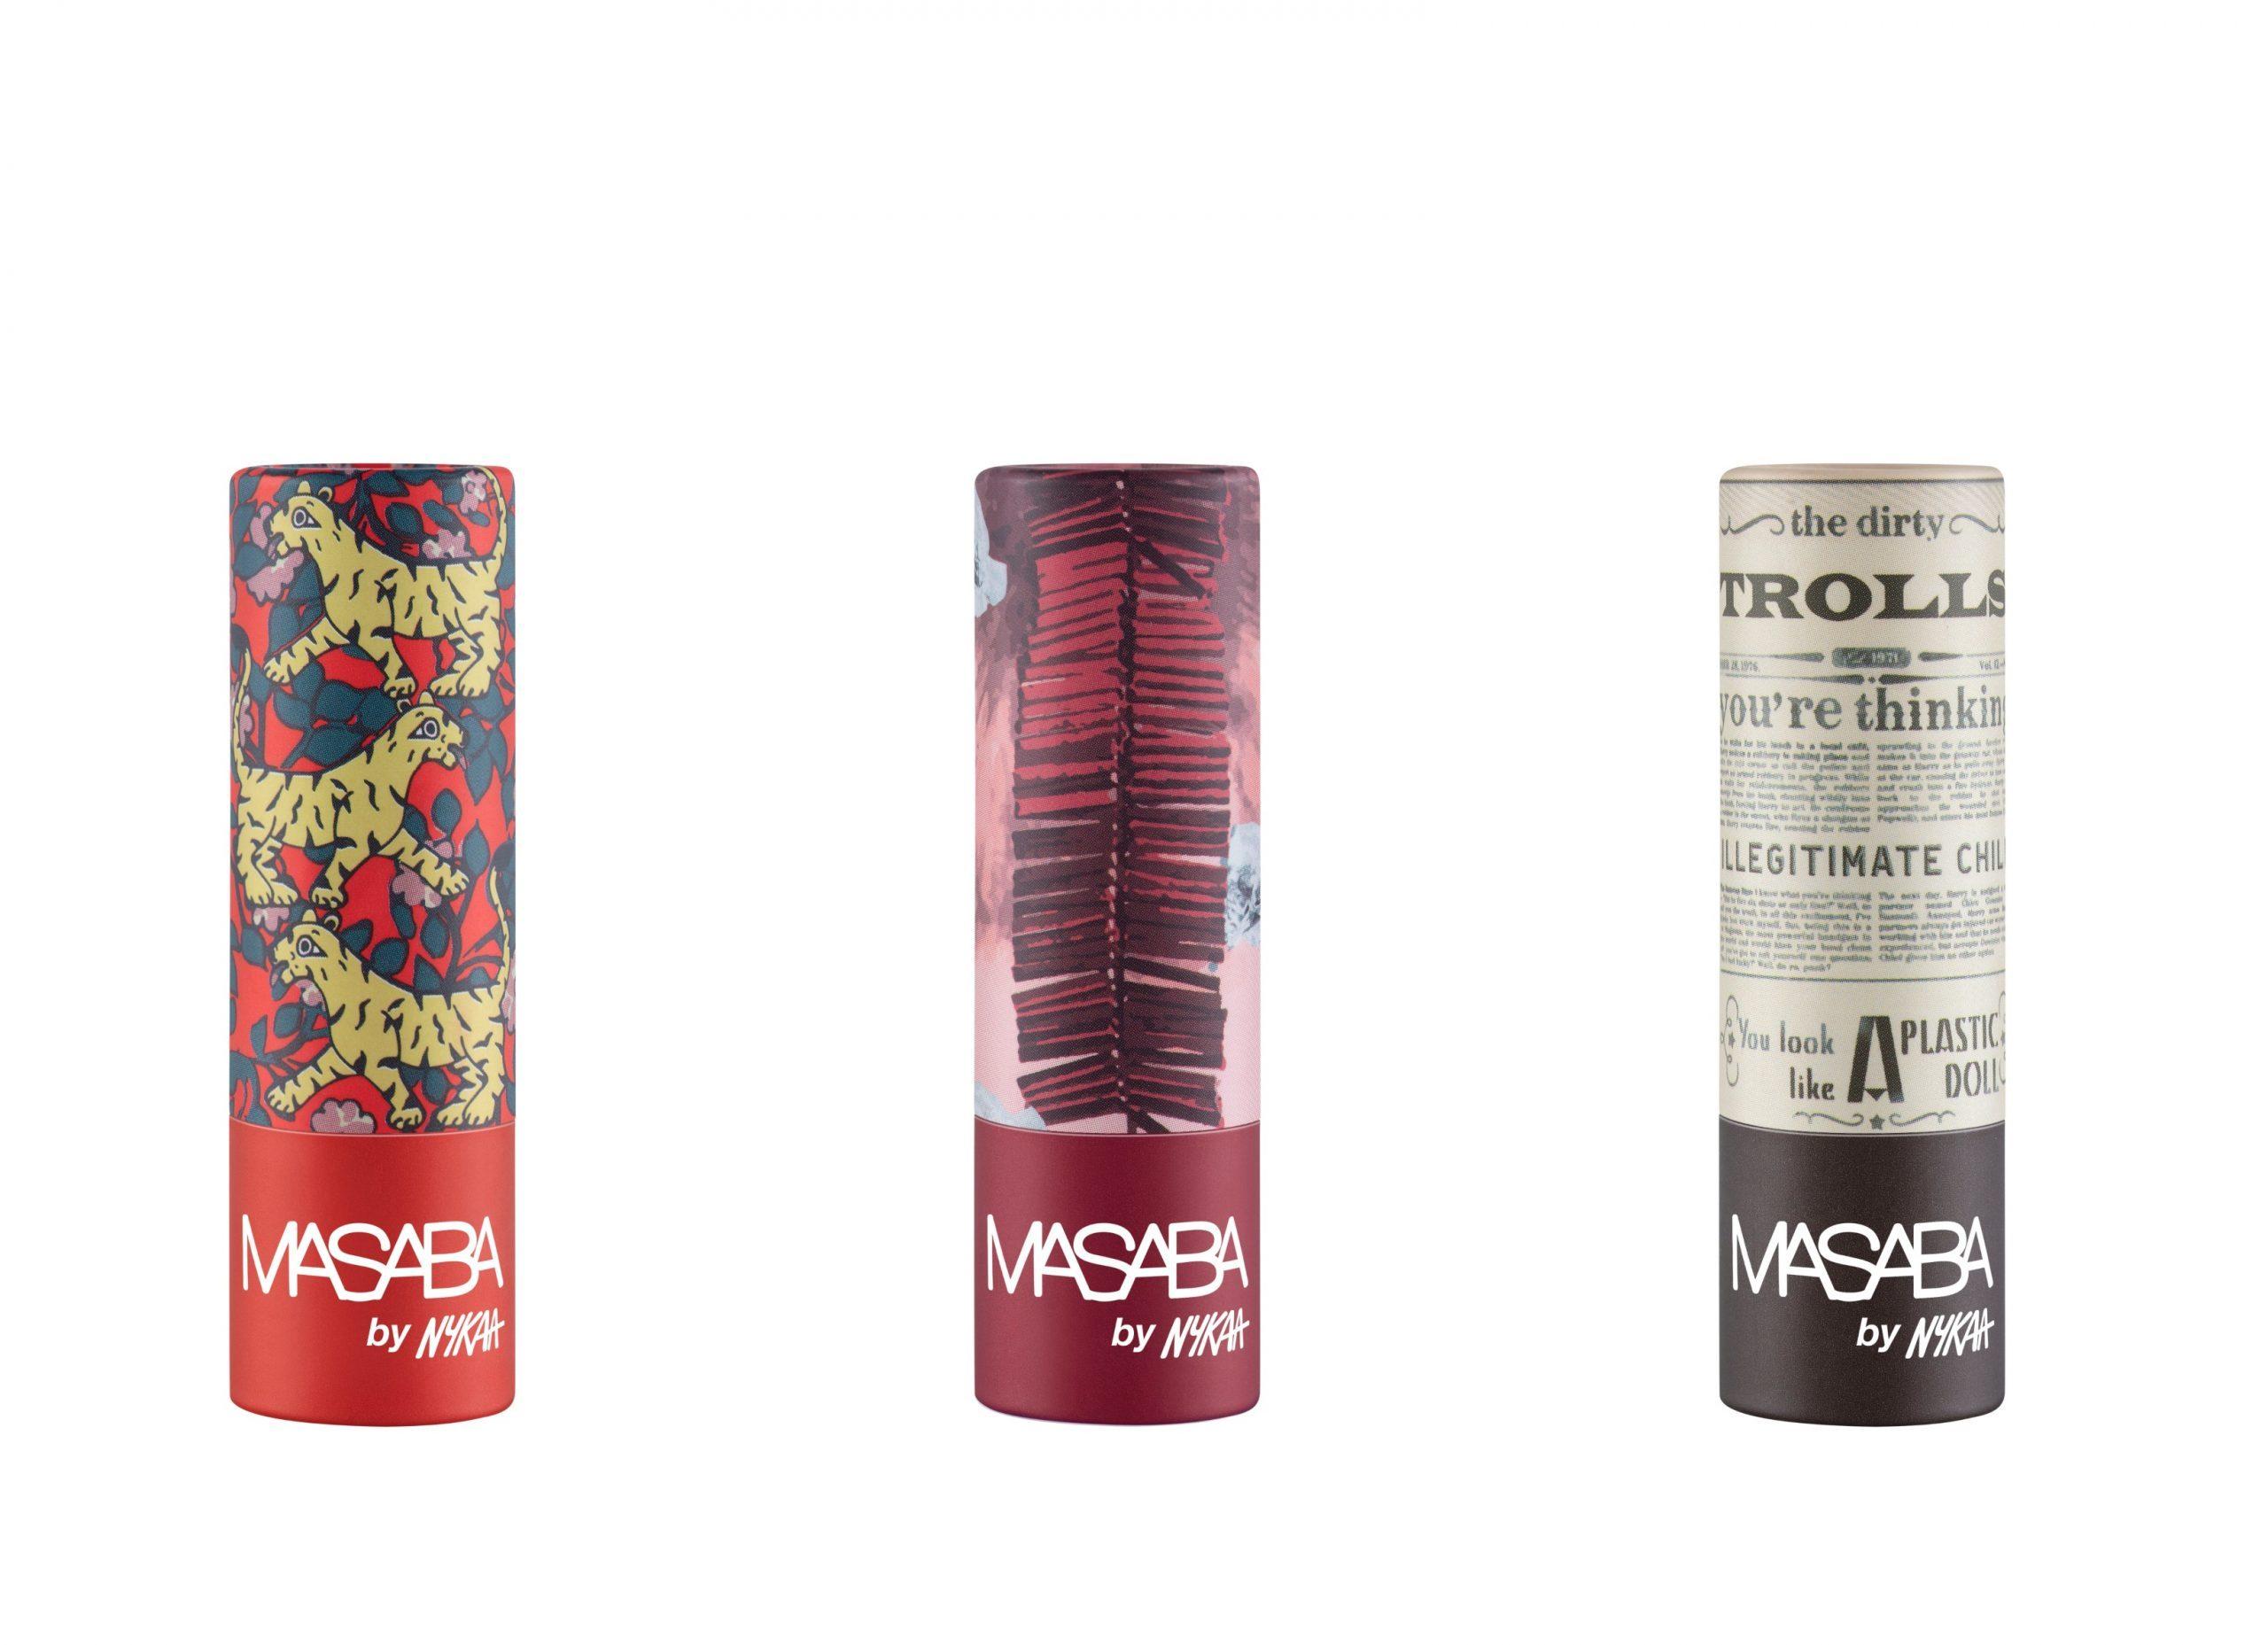 Masaba X Nykaa products